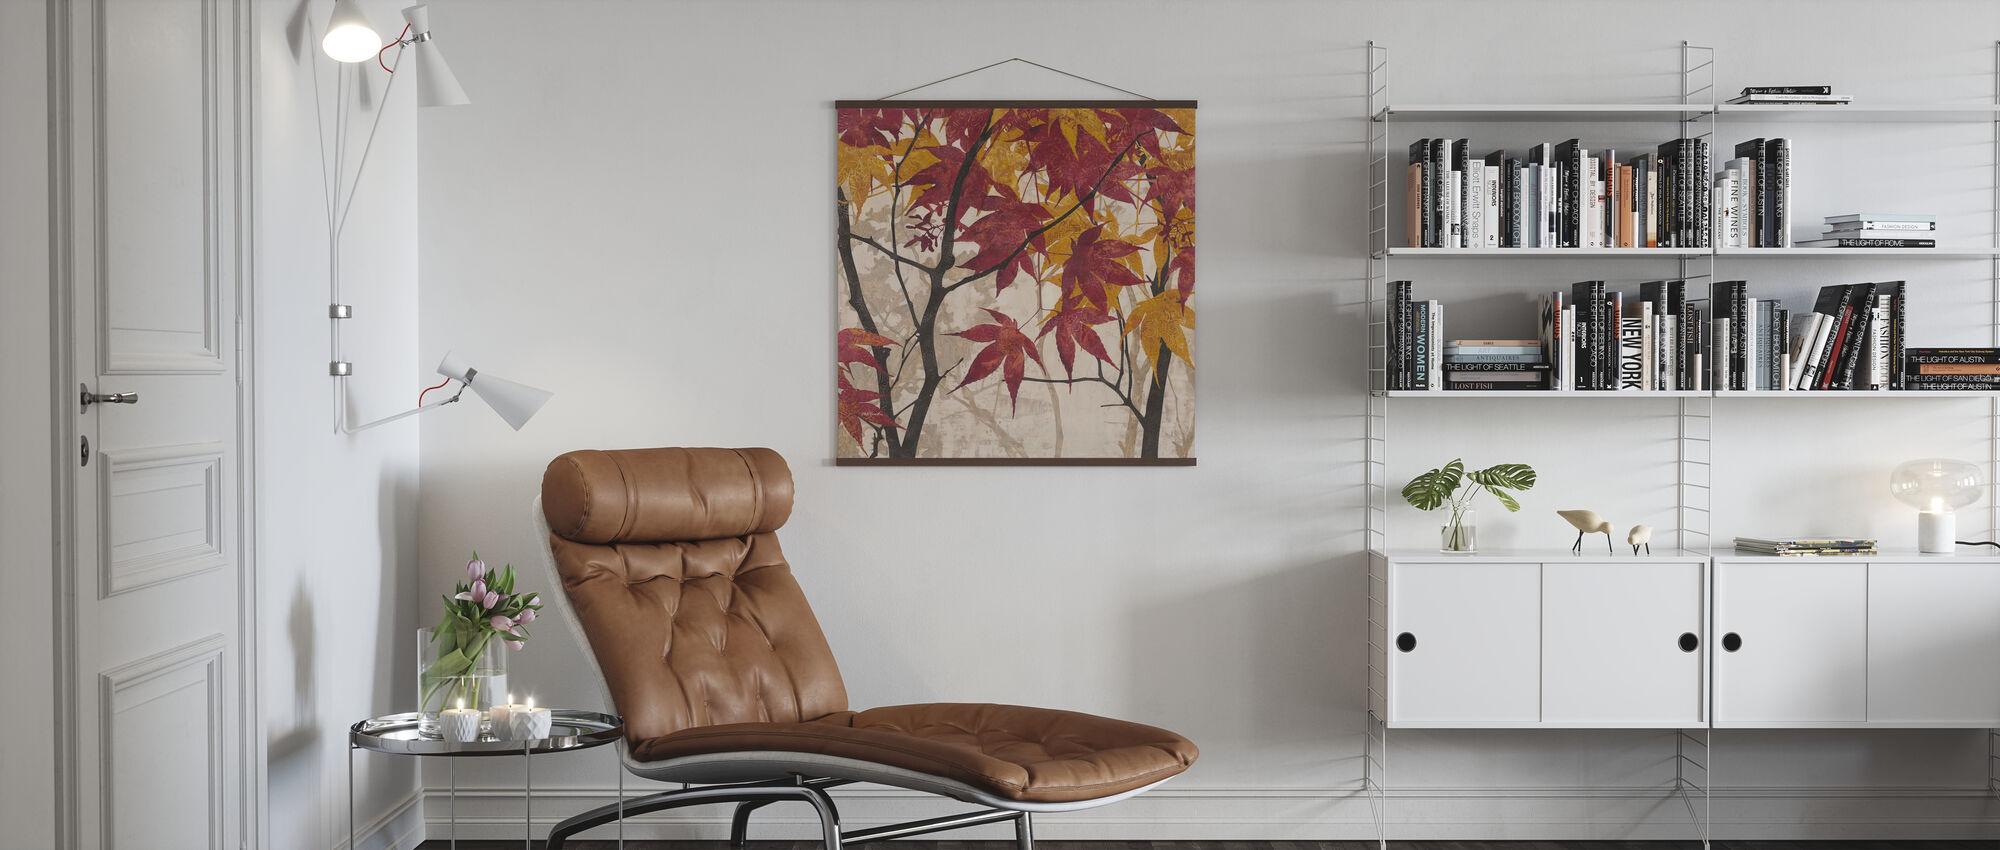 Maple Story 1 - Poster - Living Room